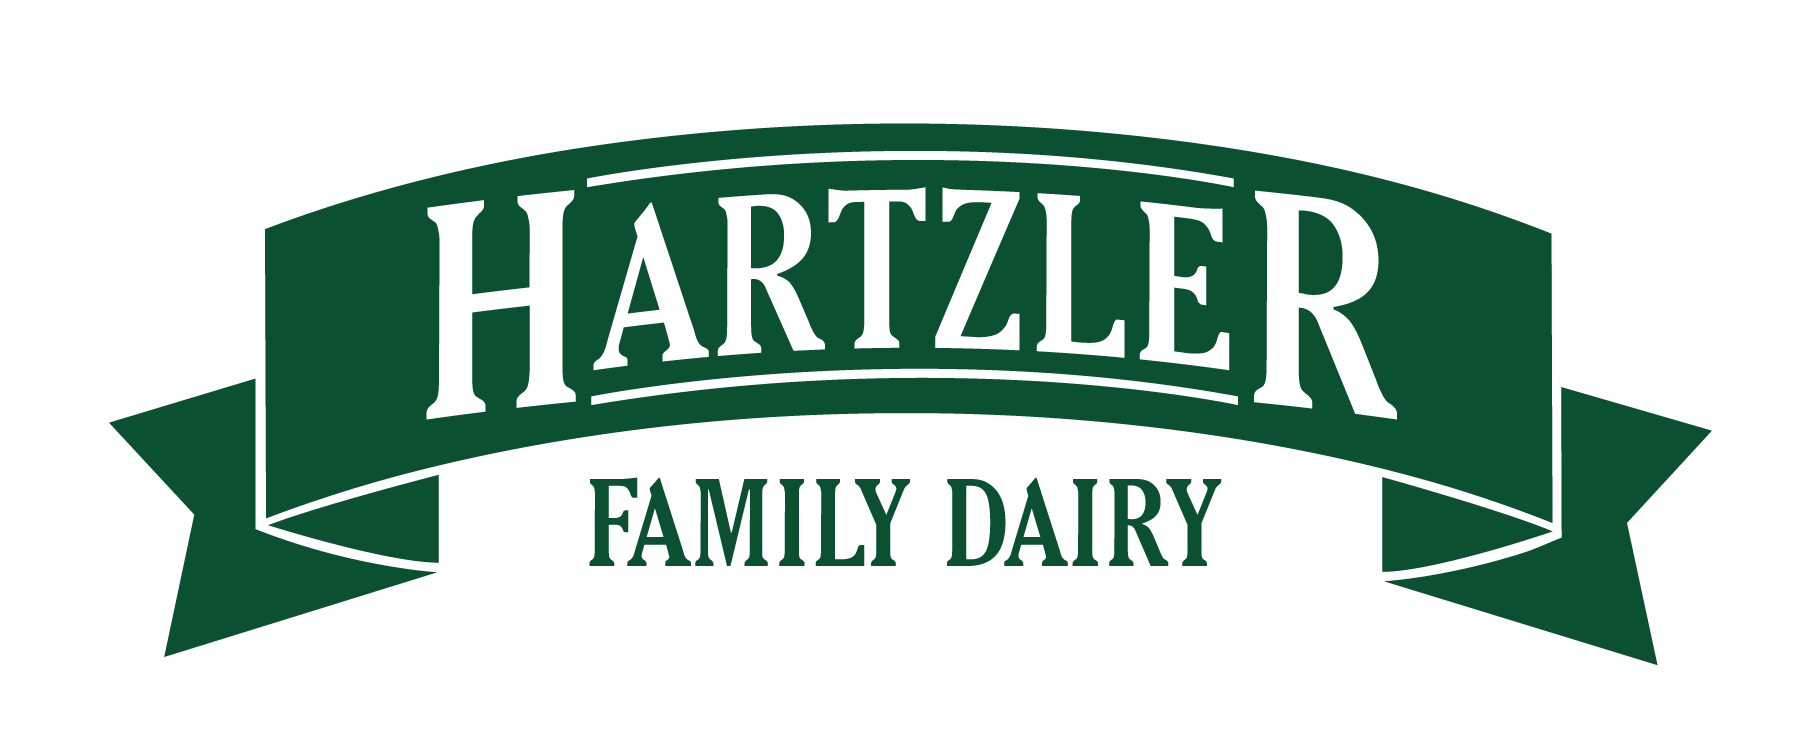 Hartzler logo_Green_pointed (10).png